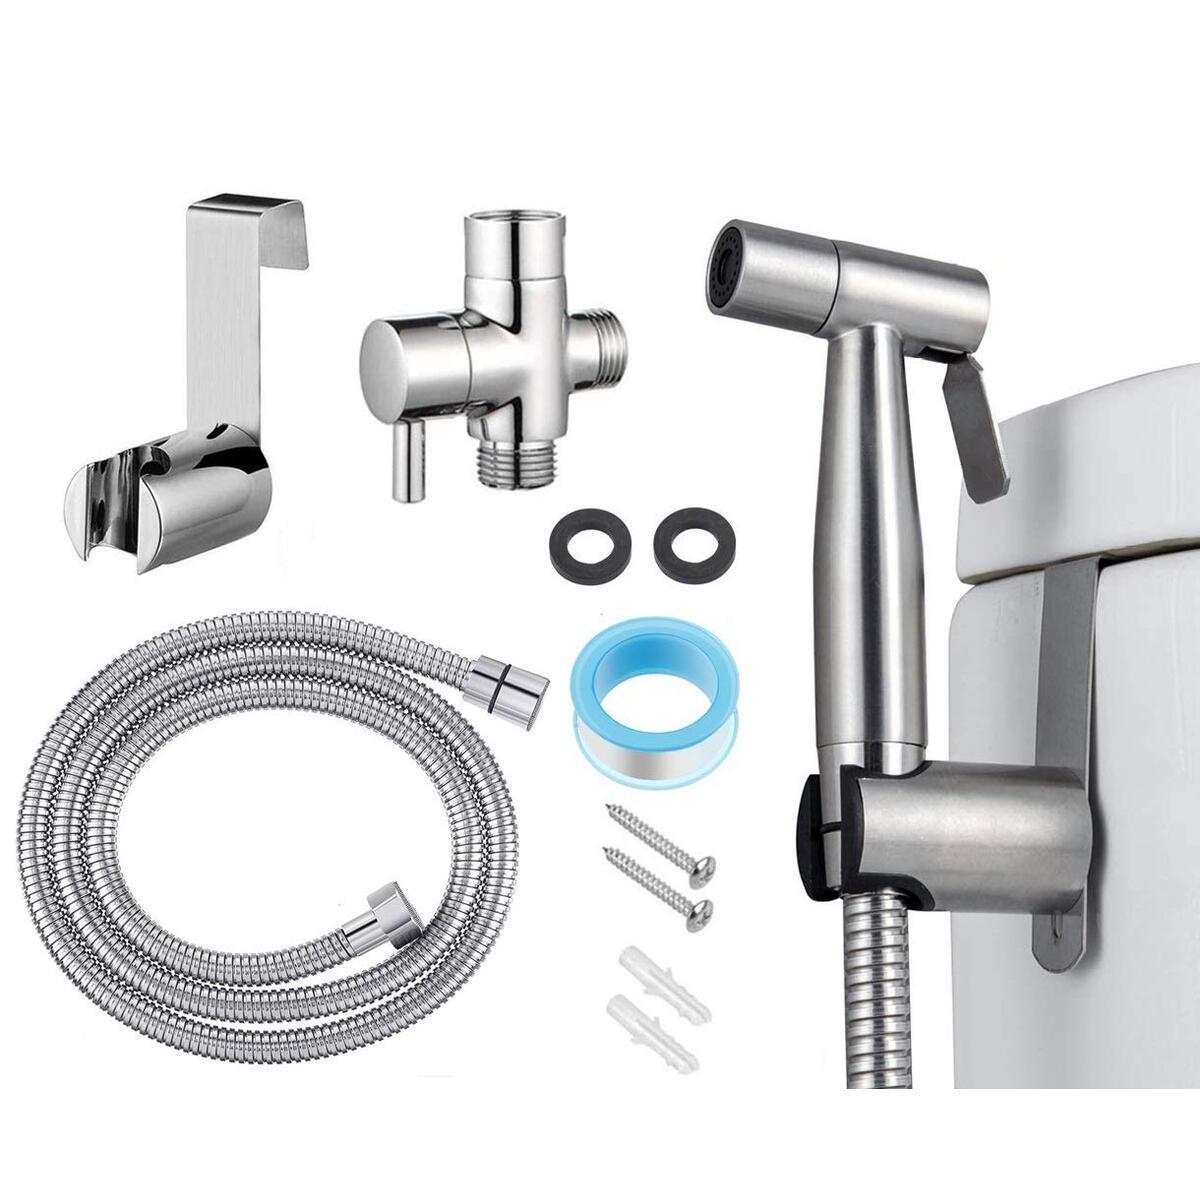 Handheld Bidet Sprayer for Toilet, Stainless Steel Bidet for Toilet, Complete Set Leak Proof Cloth Diaper Sprayer, Adjustable Water Pressure Bidet Sprayer